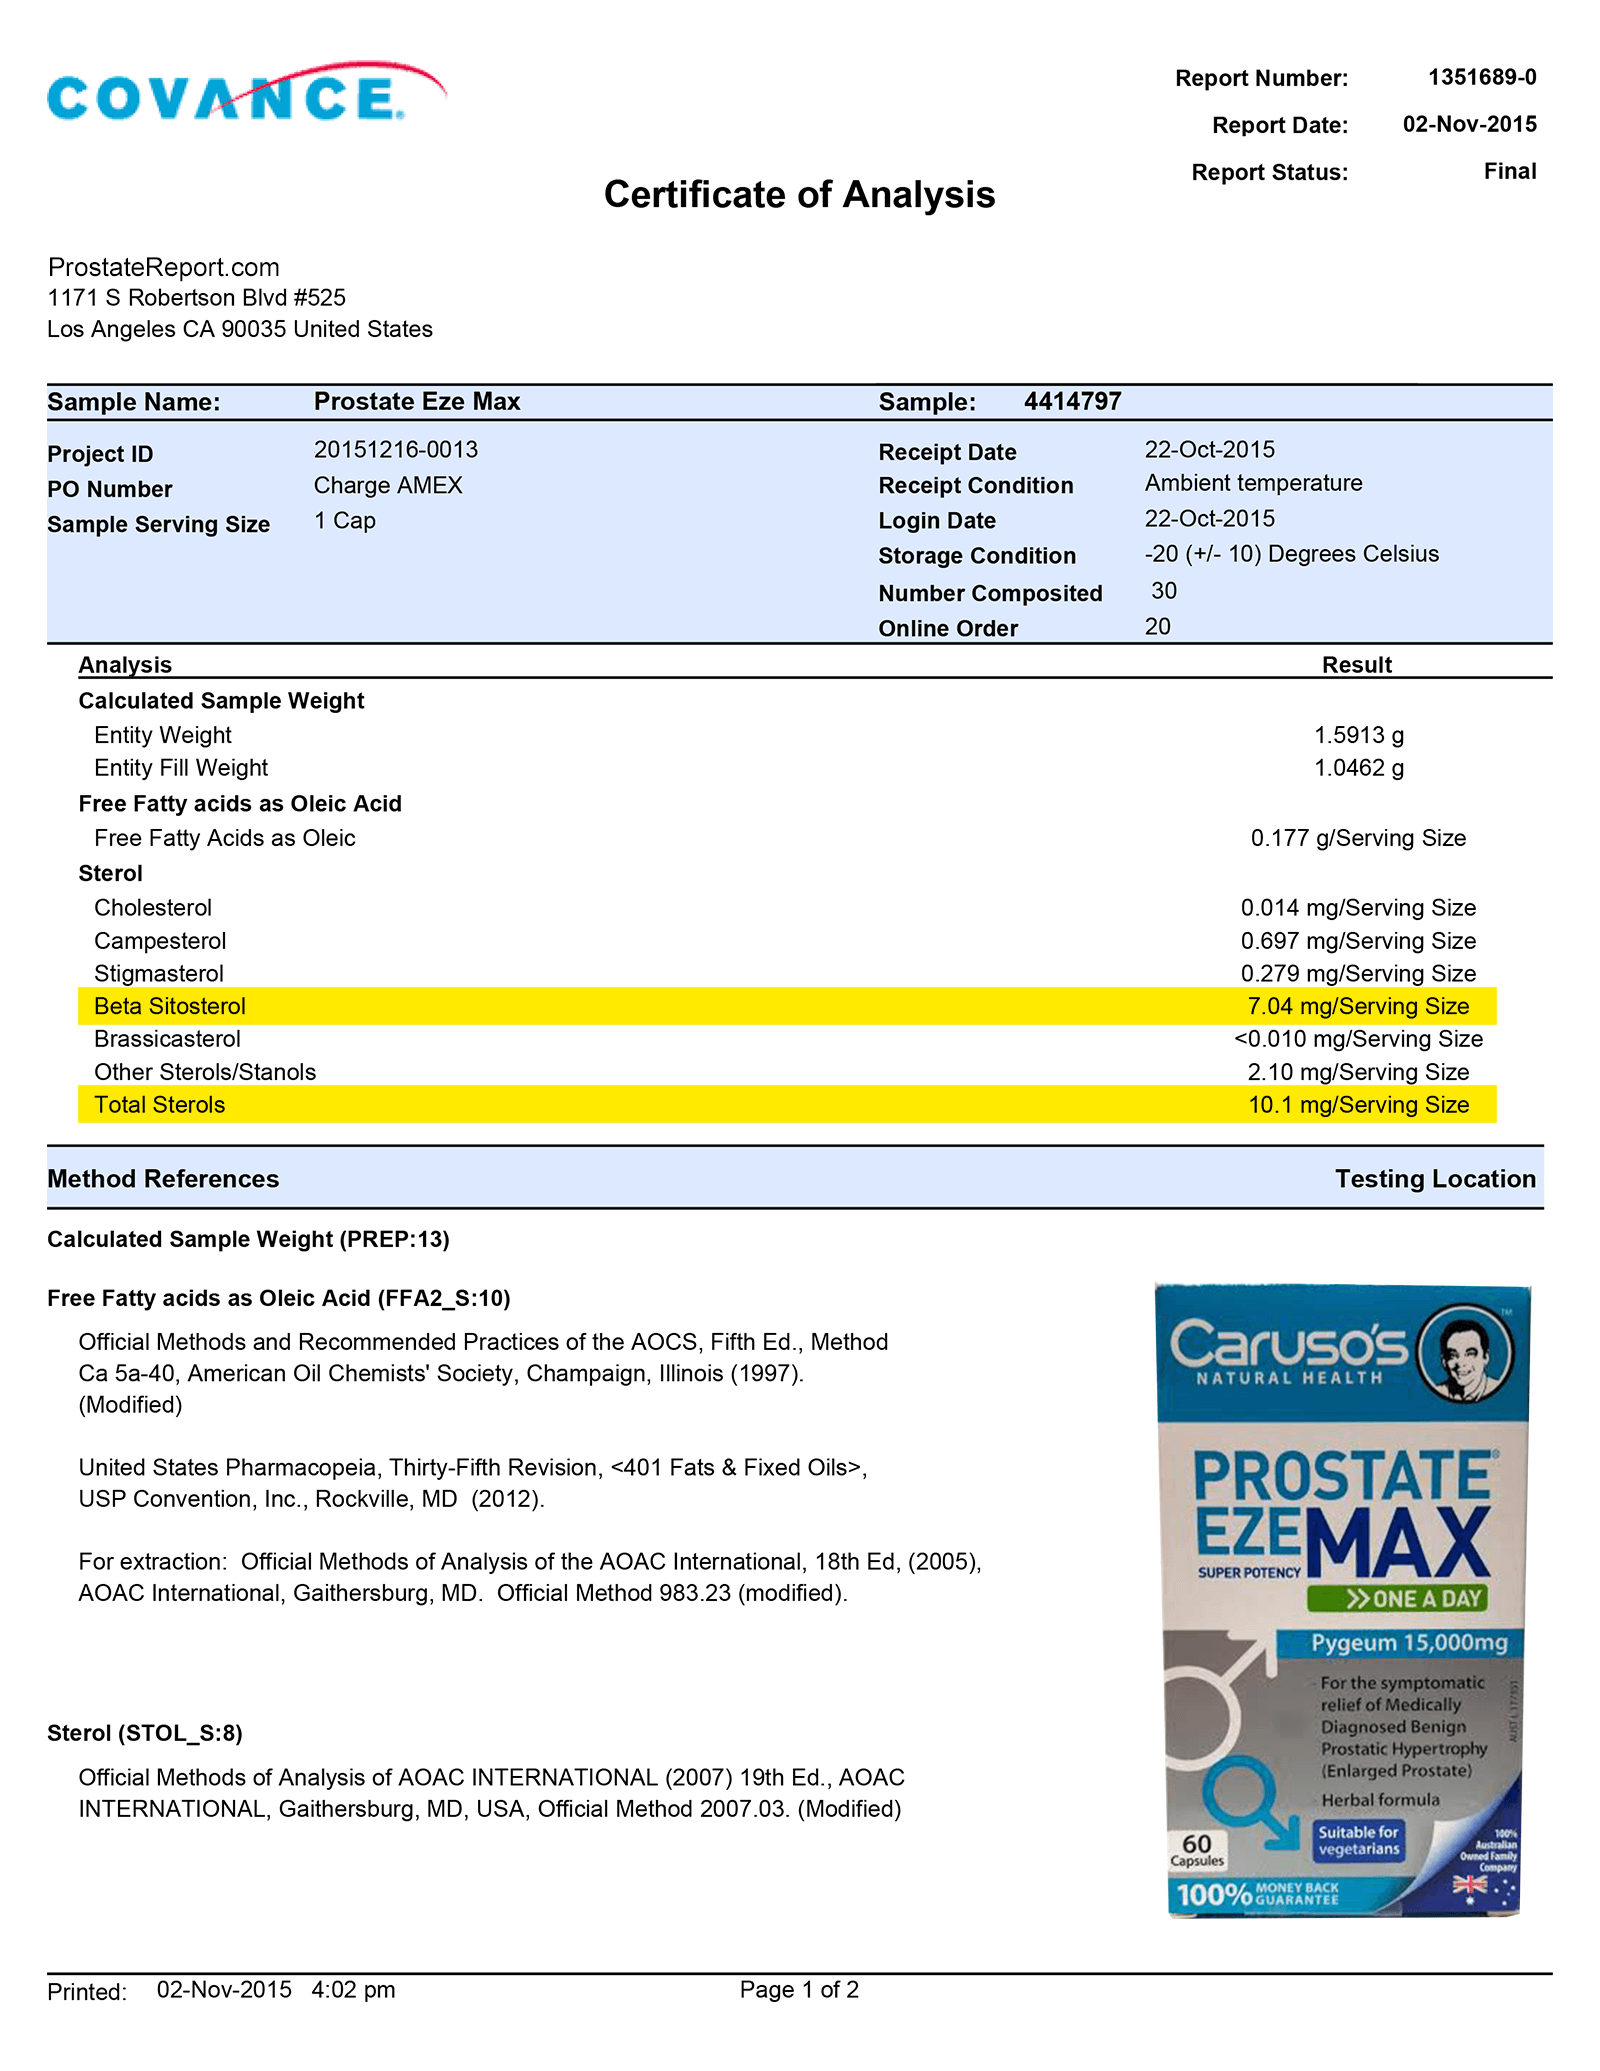 Prostate Eze Max lab report